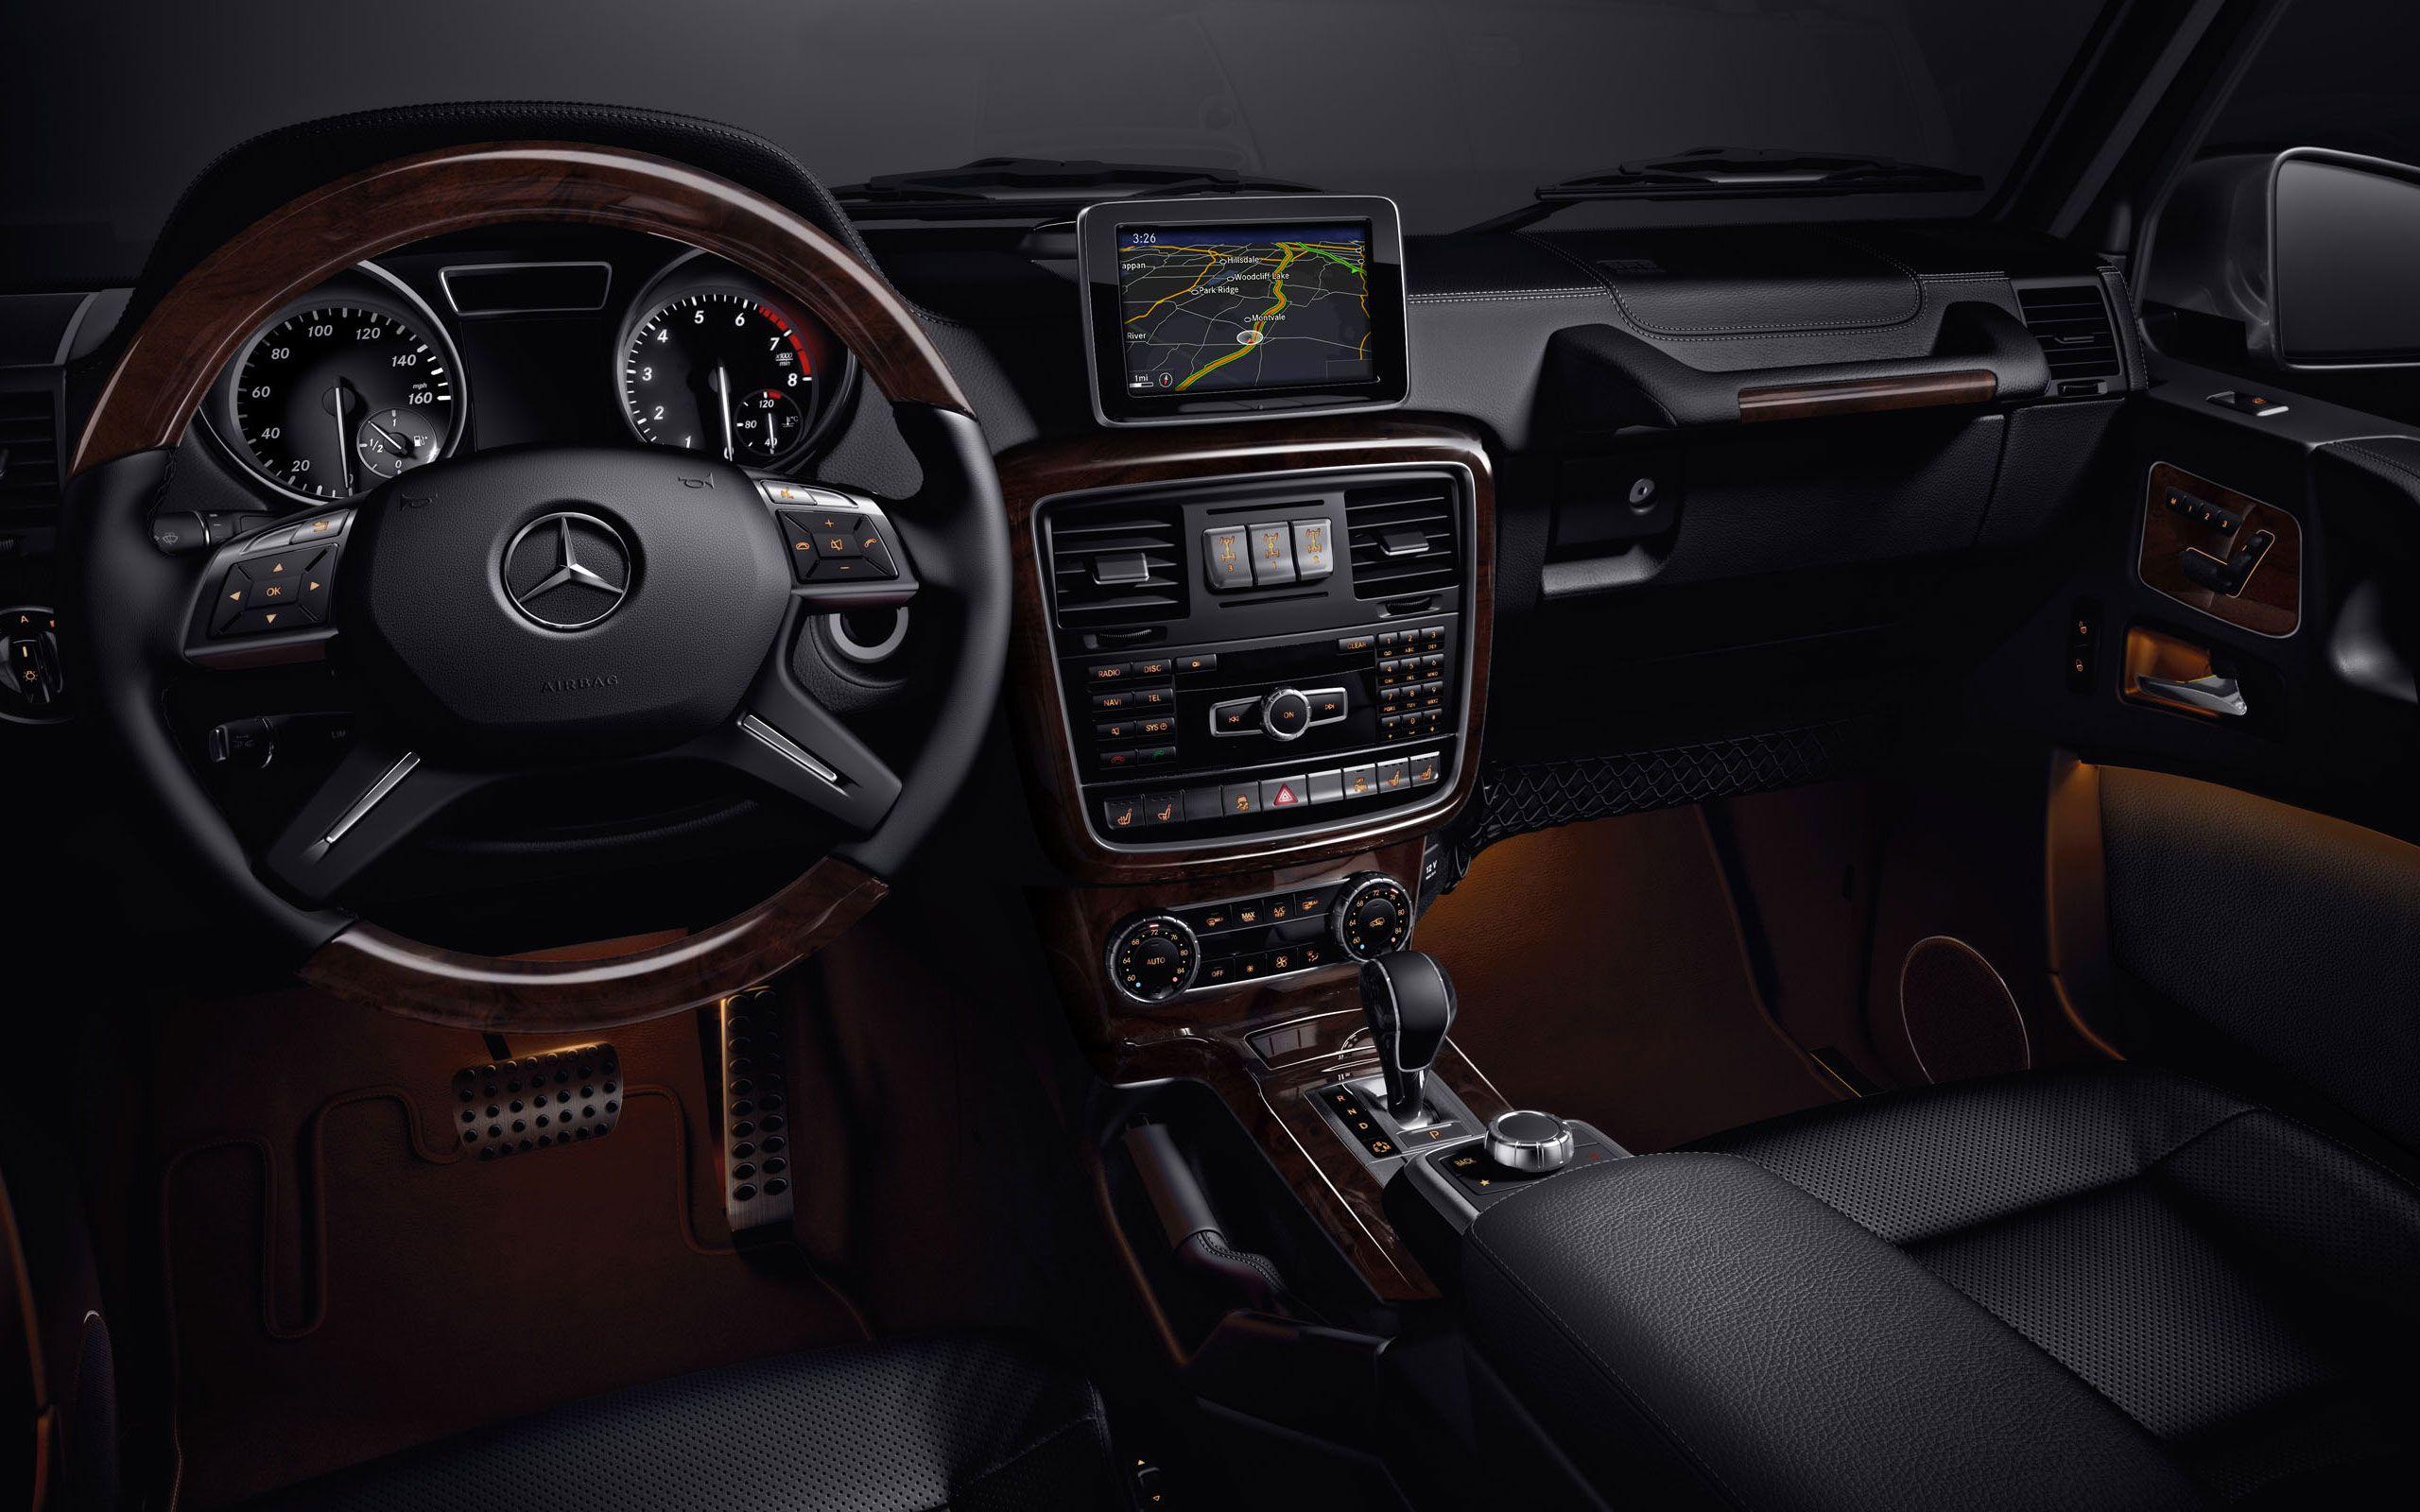 2014 Mercedes Benz G550 G Class Suv Car Interior Dashboard